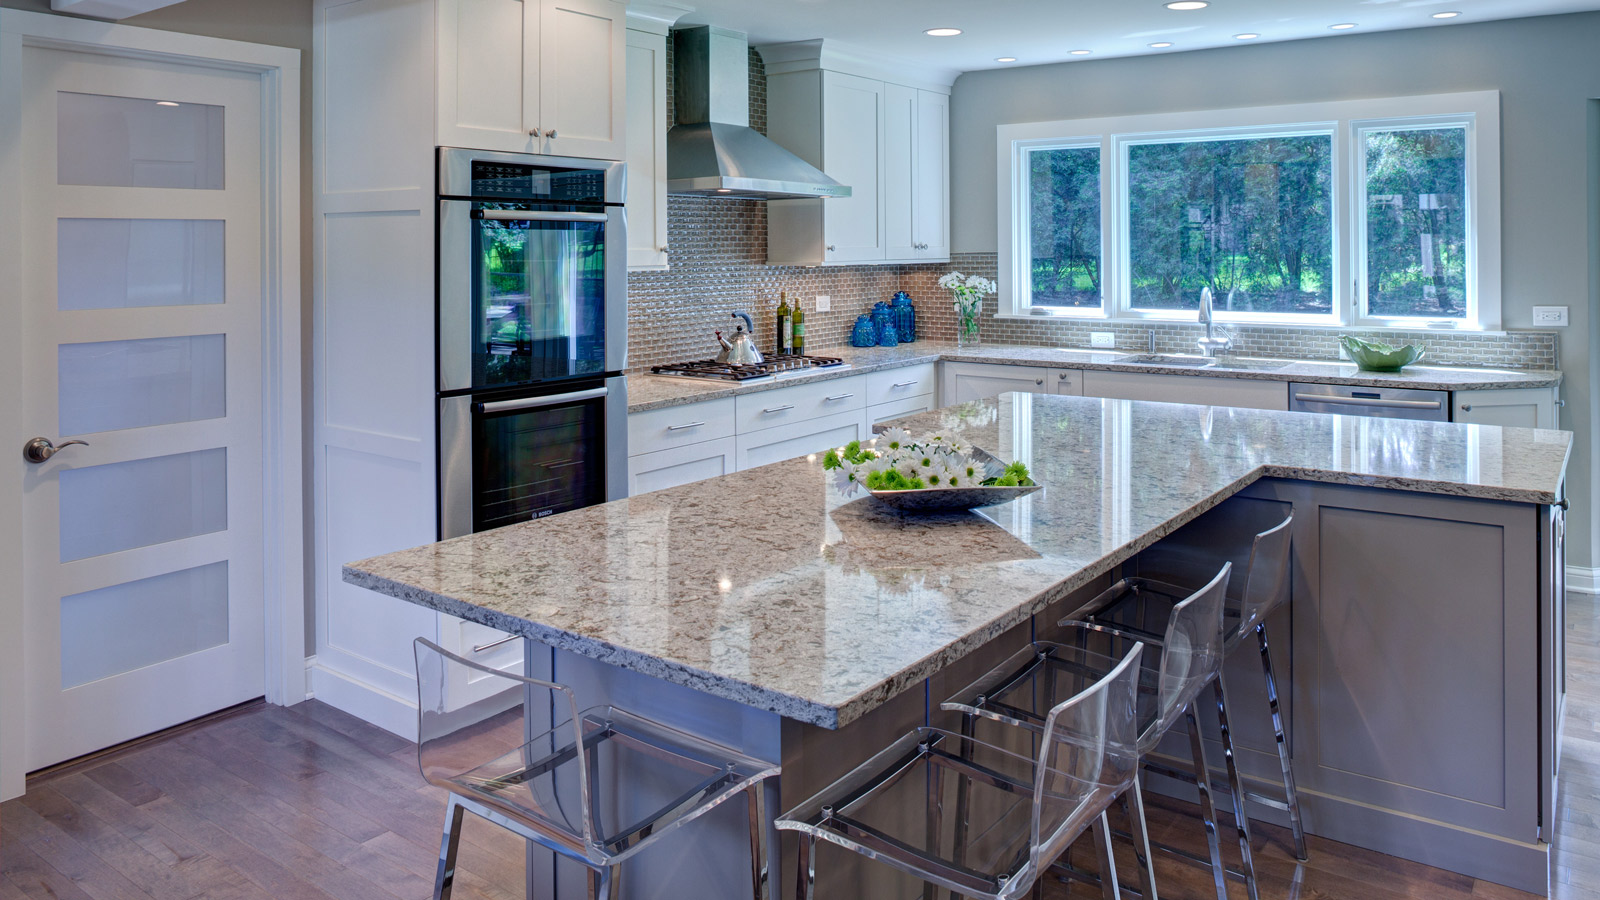 2013 Award Winning Transitional Kitchen Remodel Drury Design